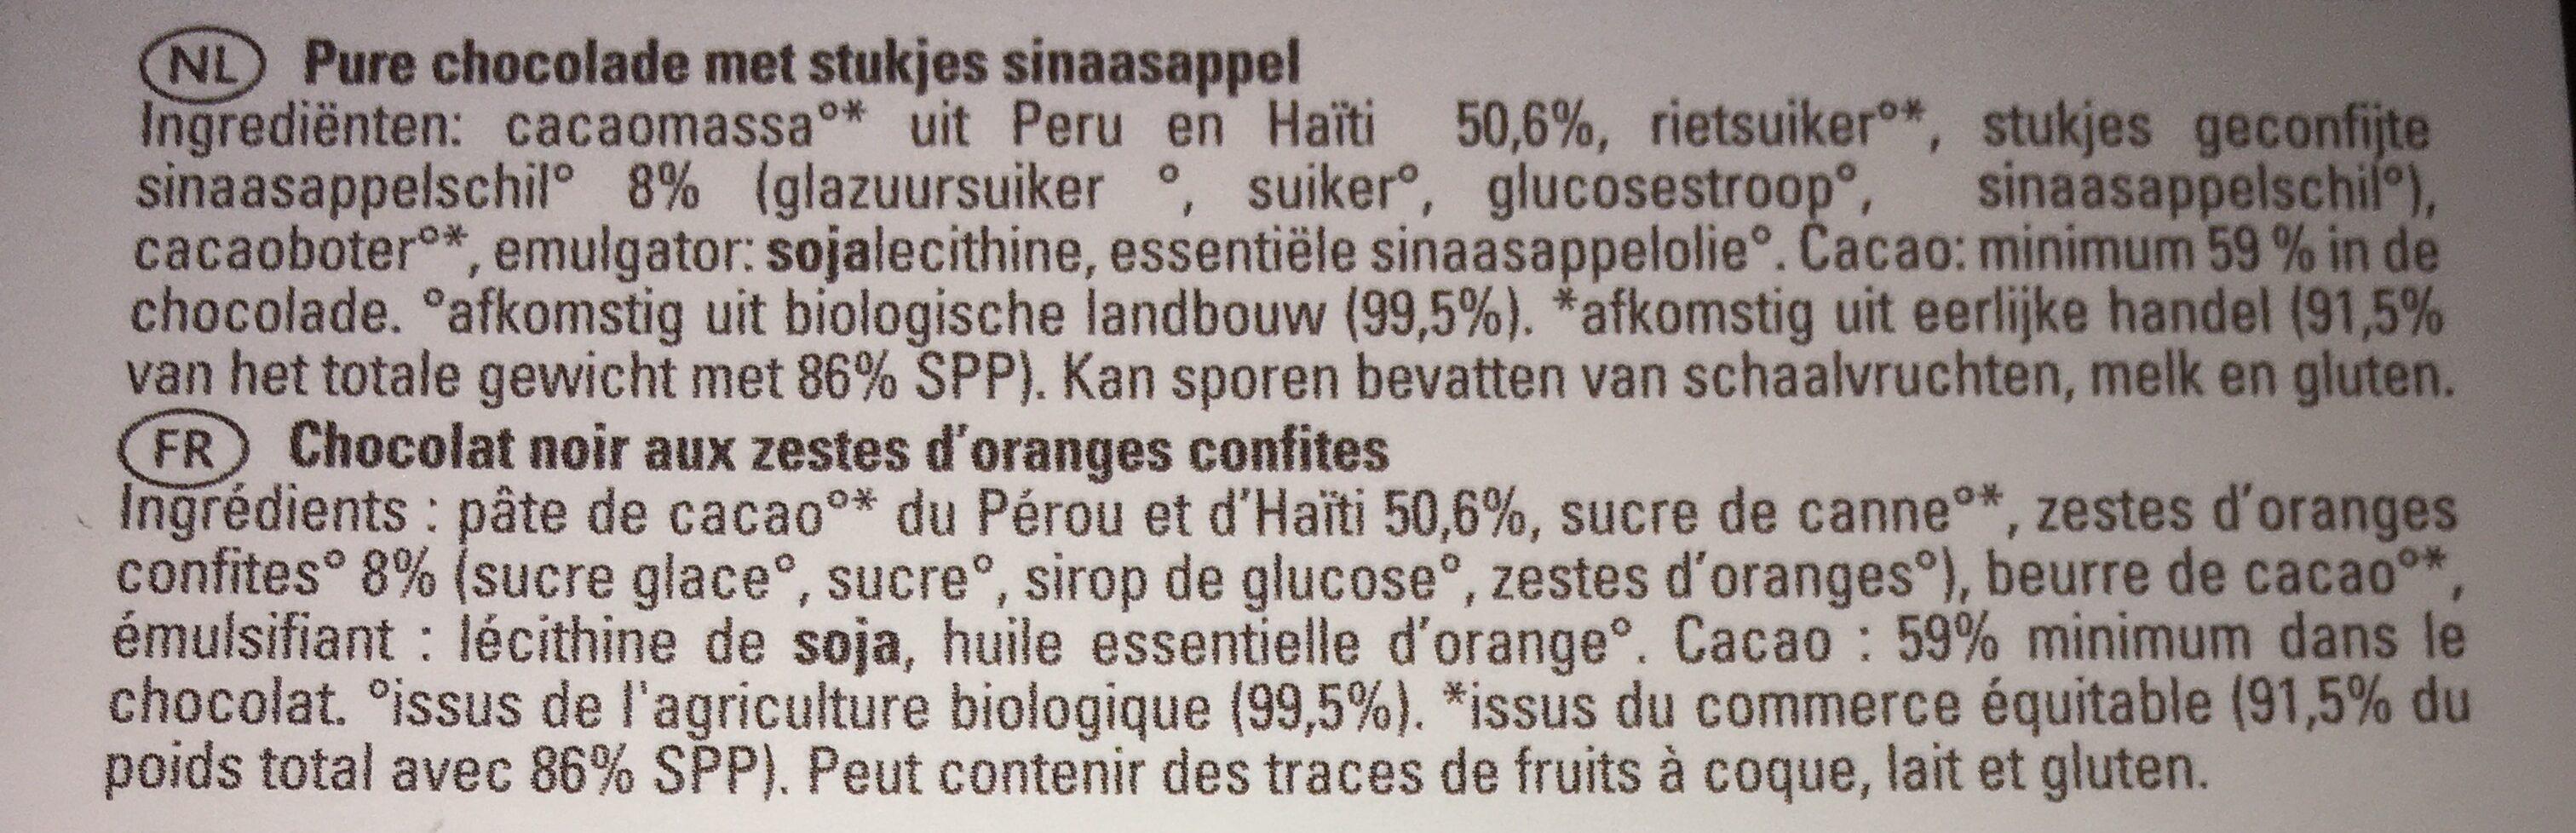 Ethiquable Noir Orange - Ingredients - fr